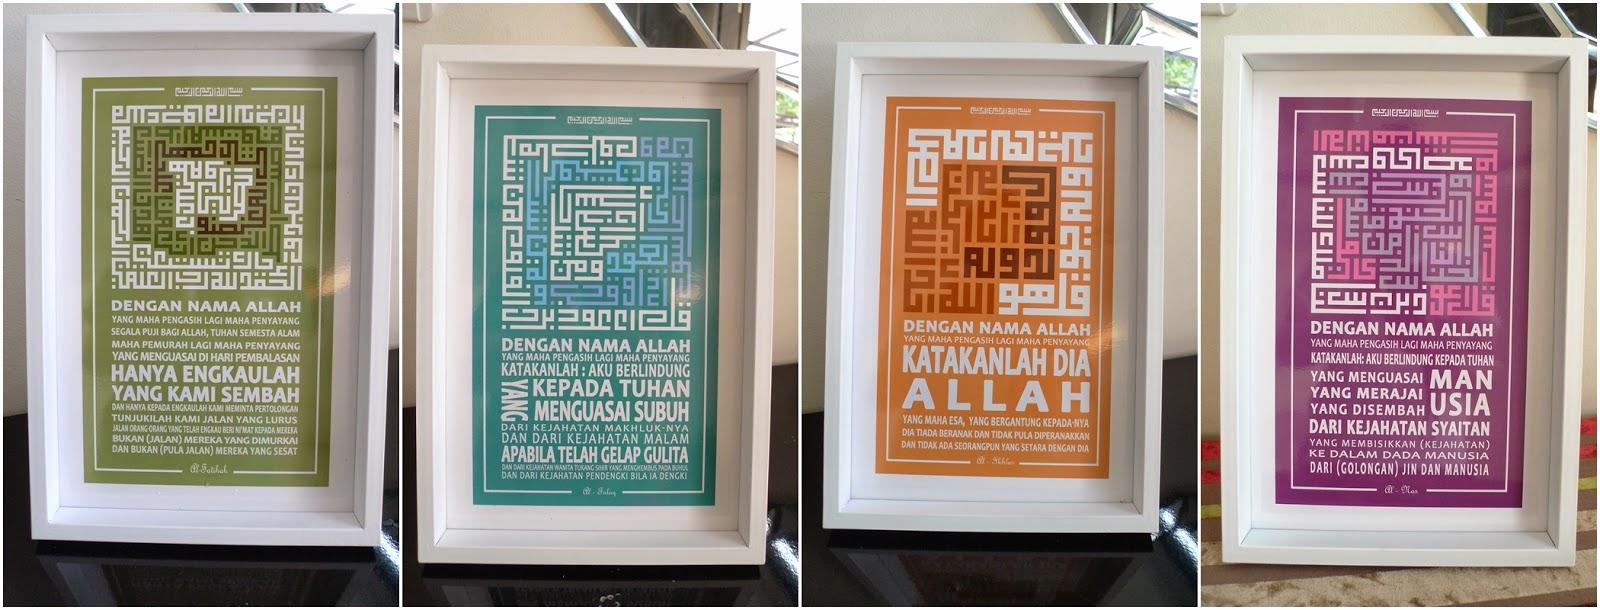 Kaligrafi Kufi Surat Pendek Alfatihah Alikhlas Annas Alfalaq